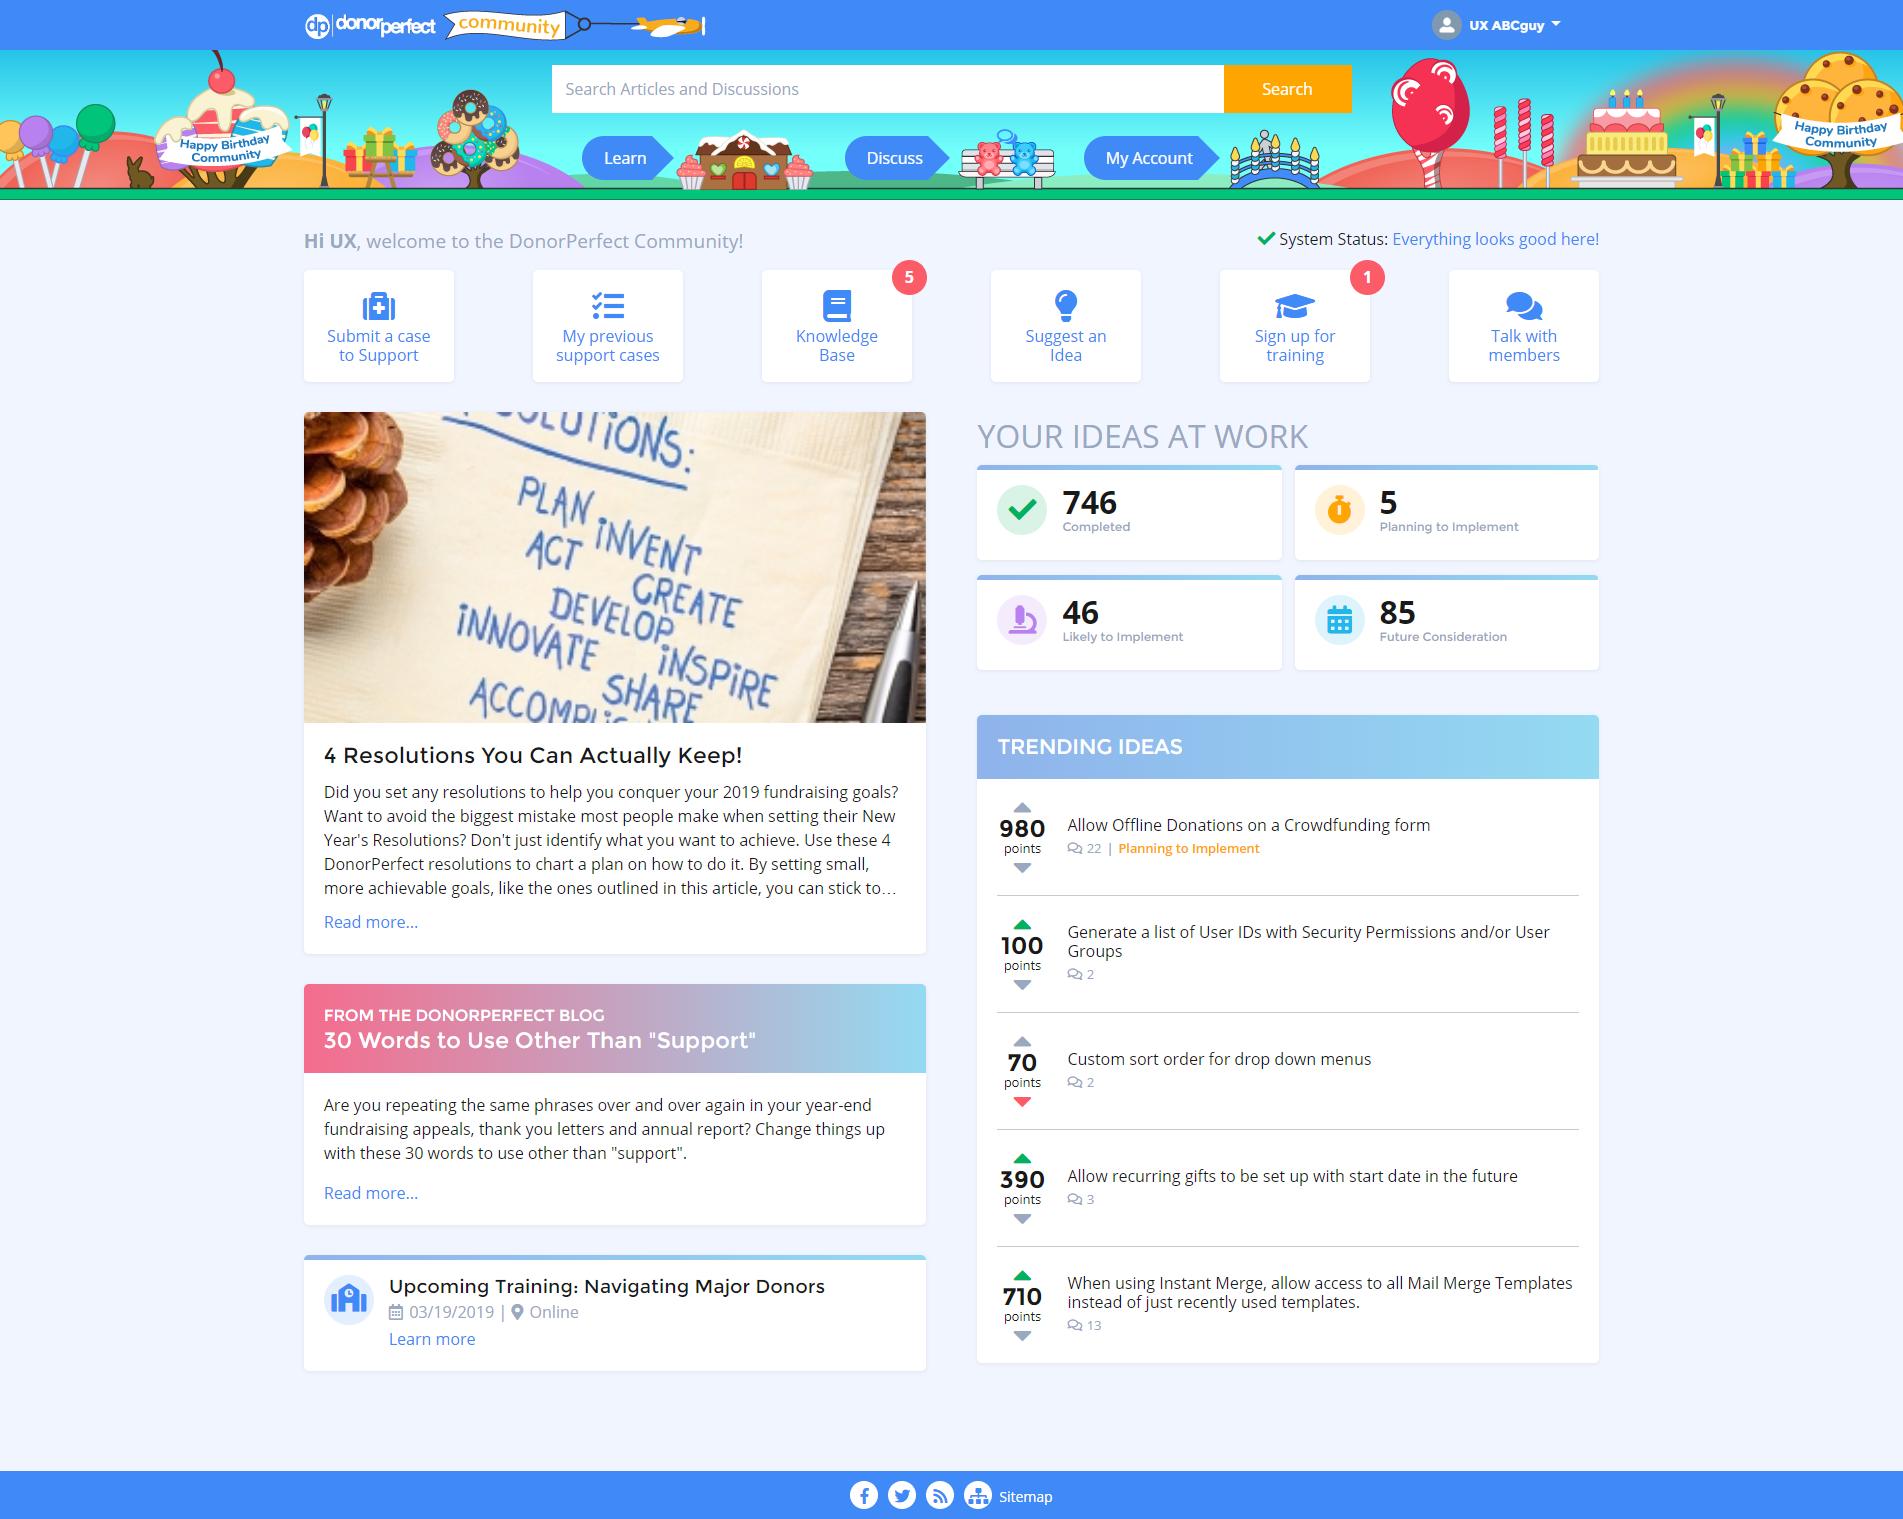 DP Community's landing page